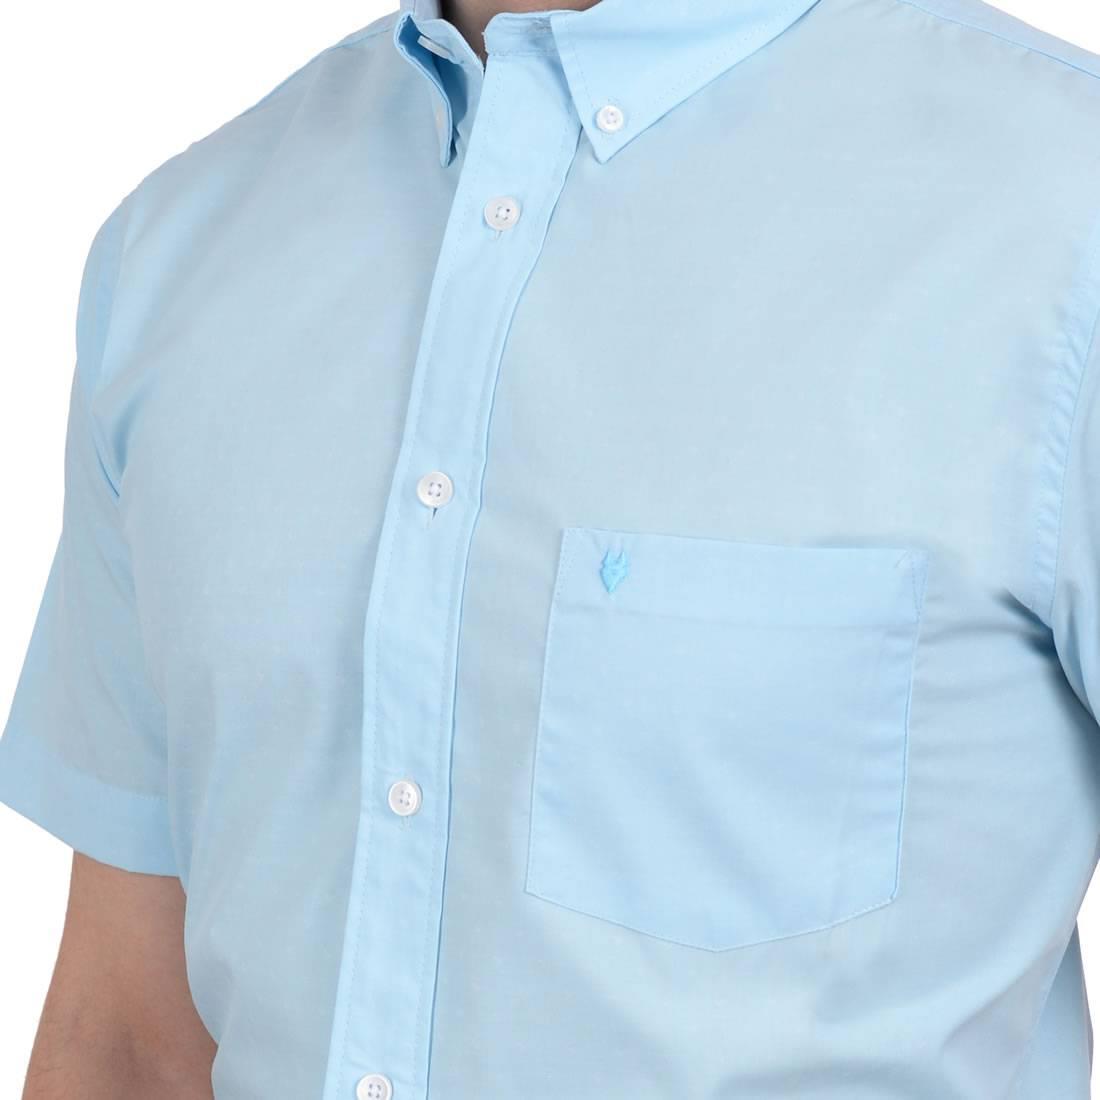 042201432426-04-Camisa-Casual-Manga-Corta-Botton-Down-Falso-Liso-Classic-Fit-Menta-yale